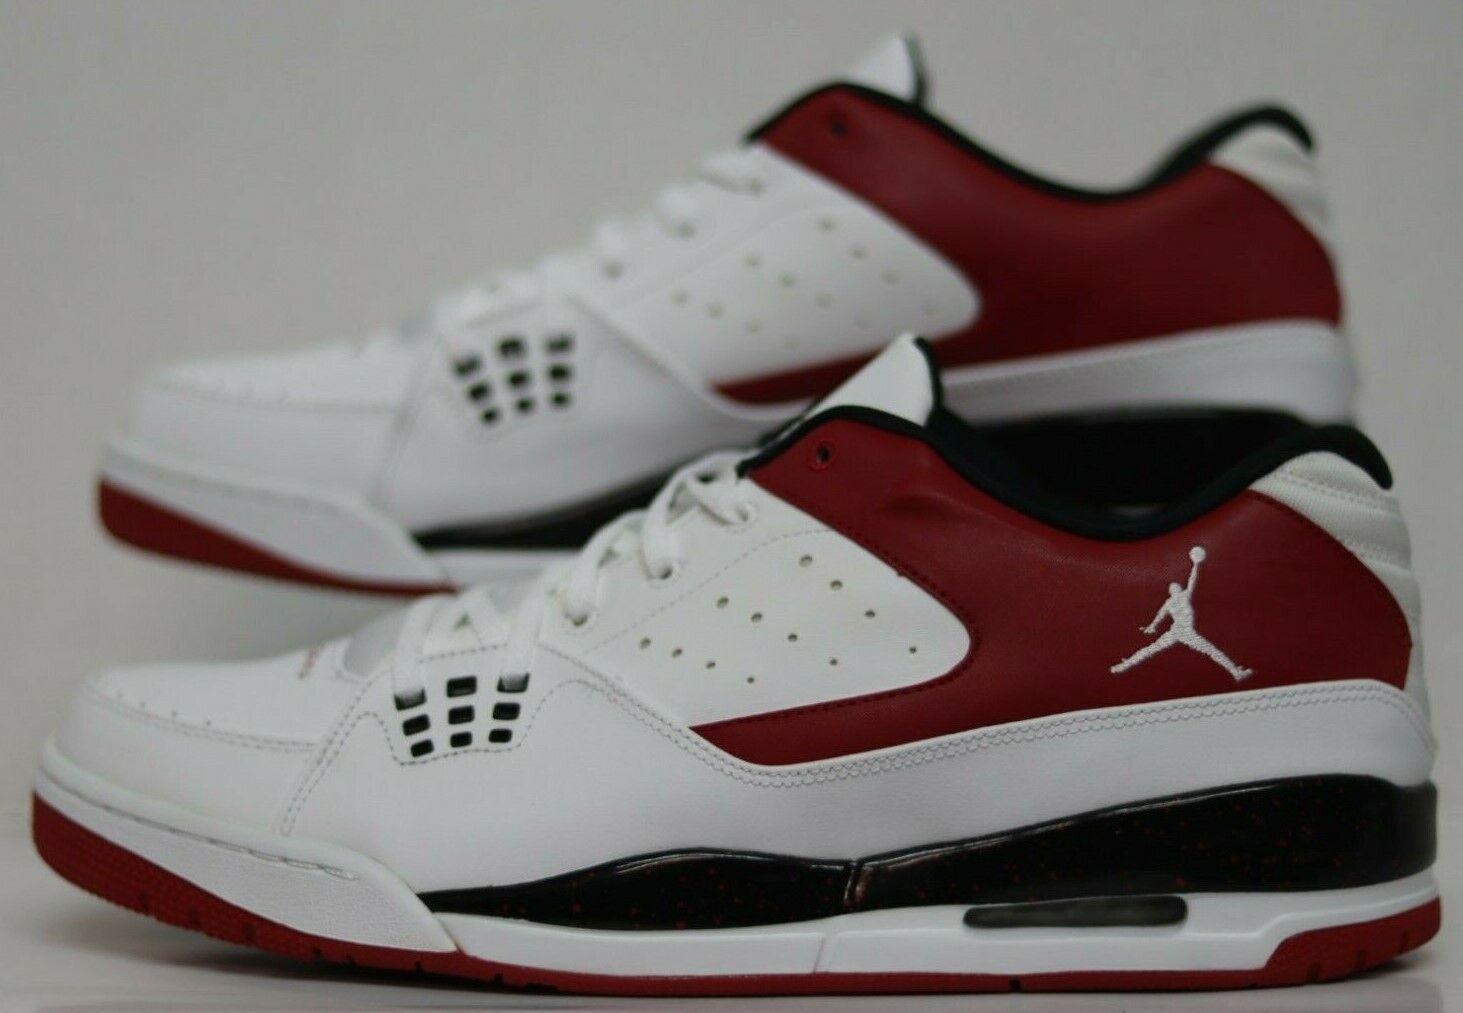 Jordan SC-1 LOW White White0GYM Red-Black 599929-101 Mens Size 13.0